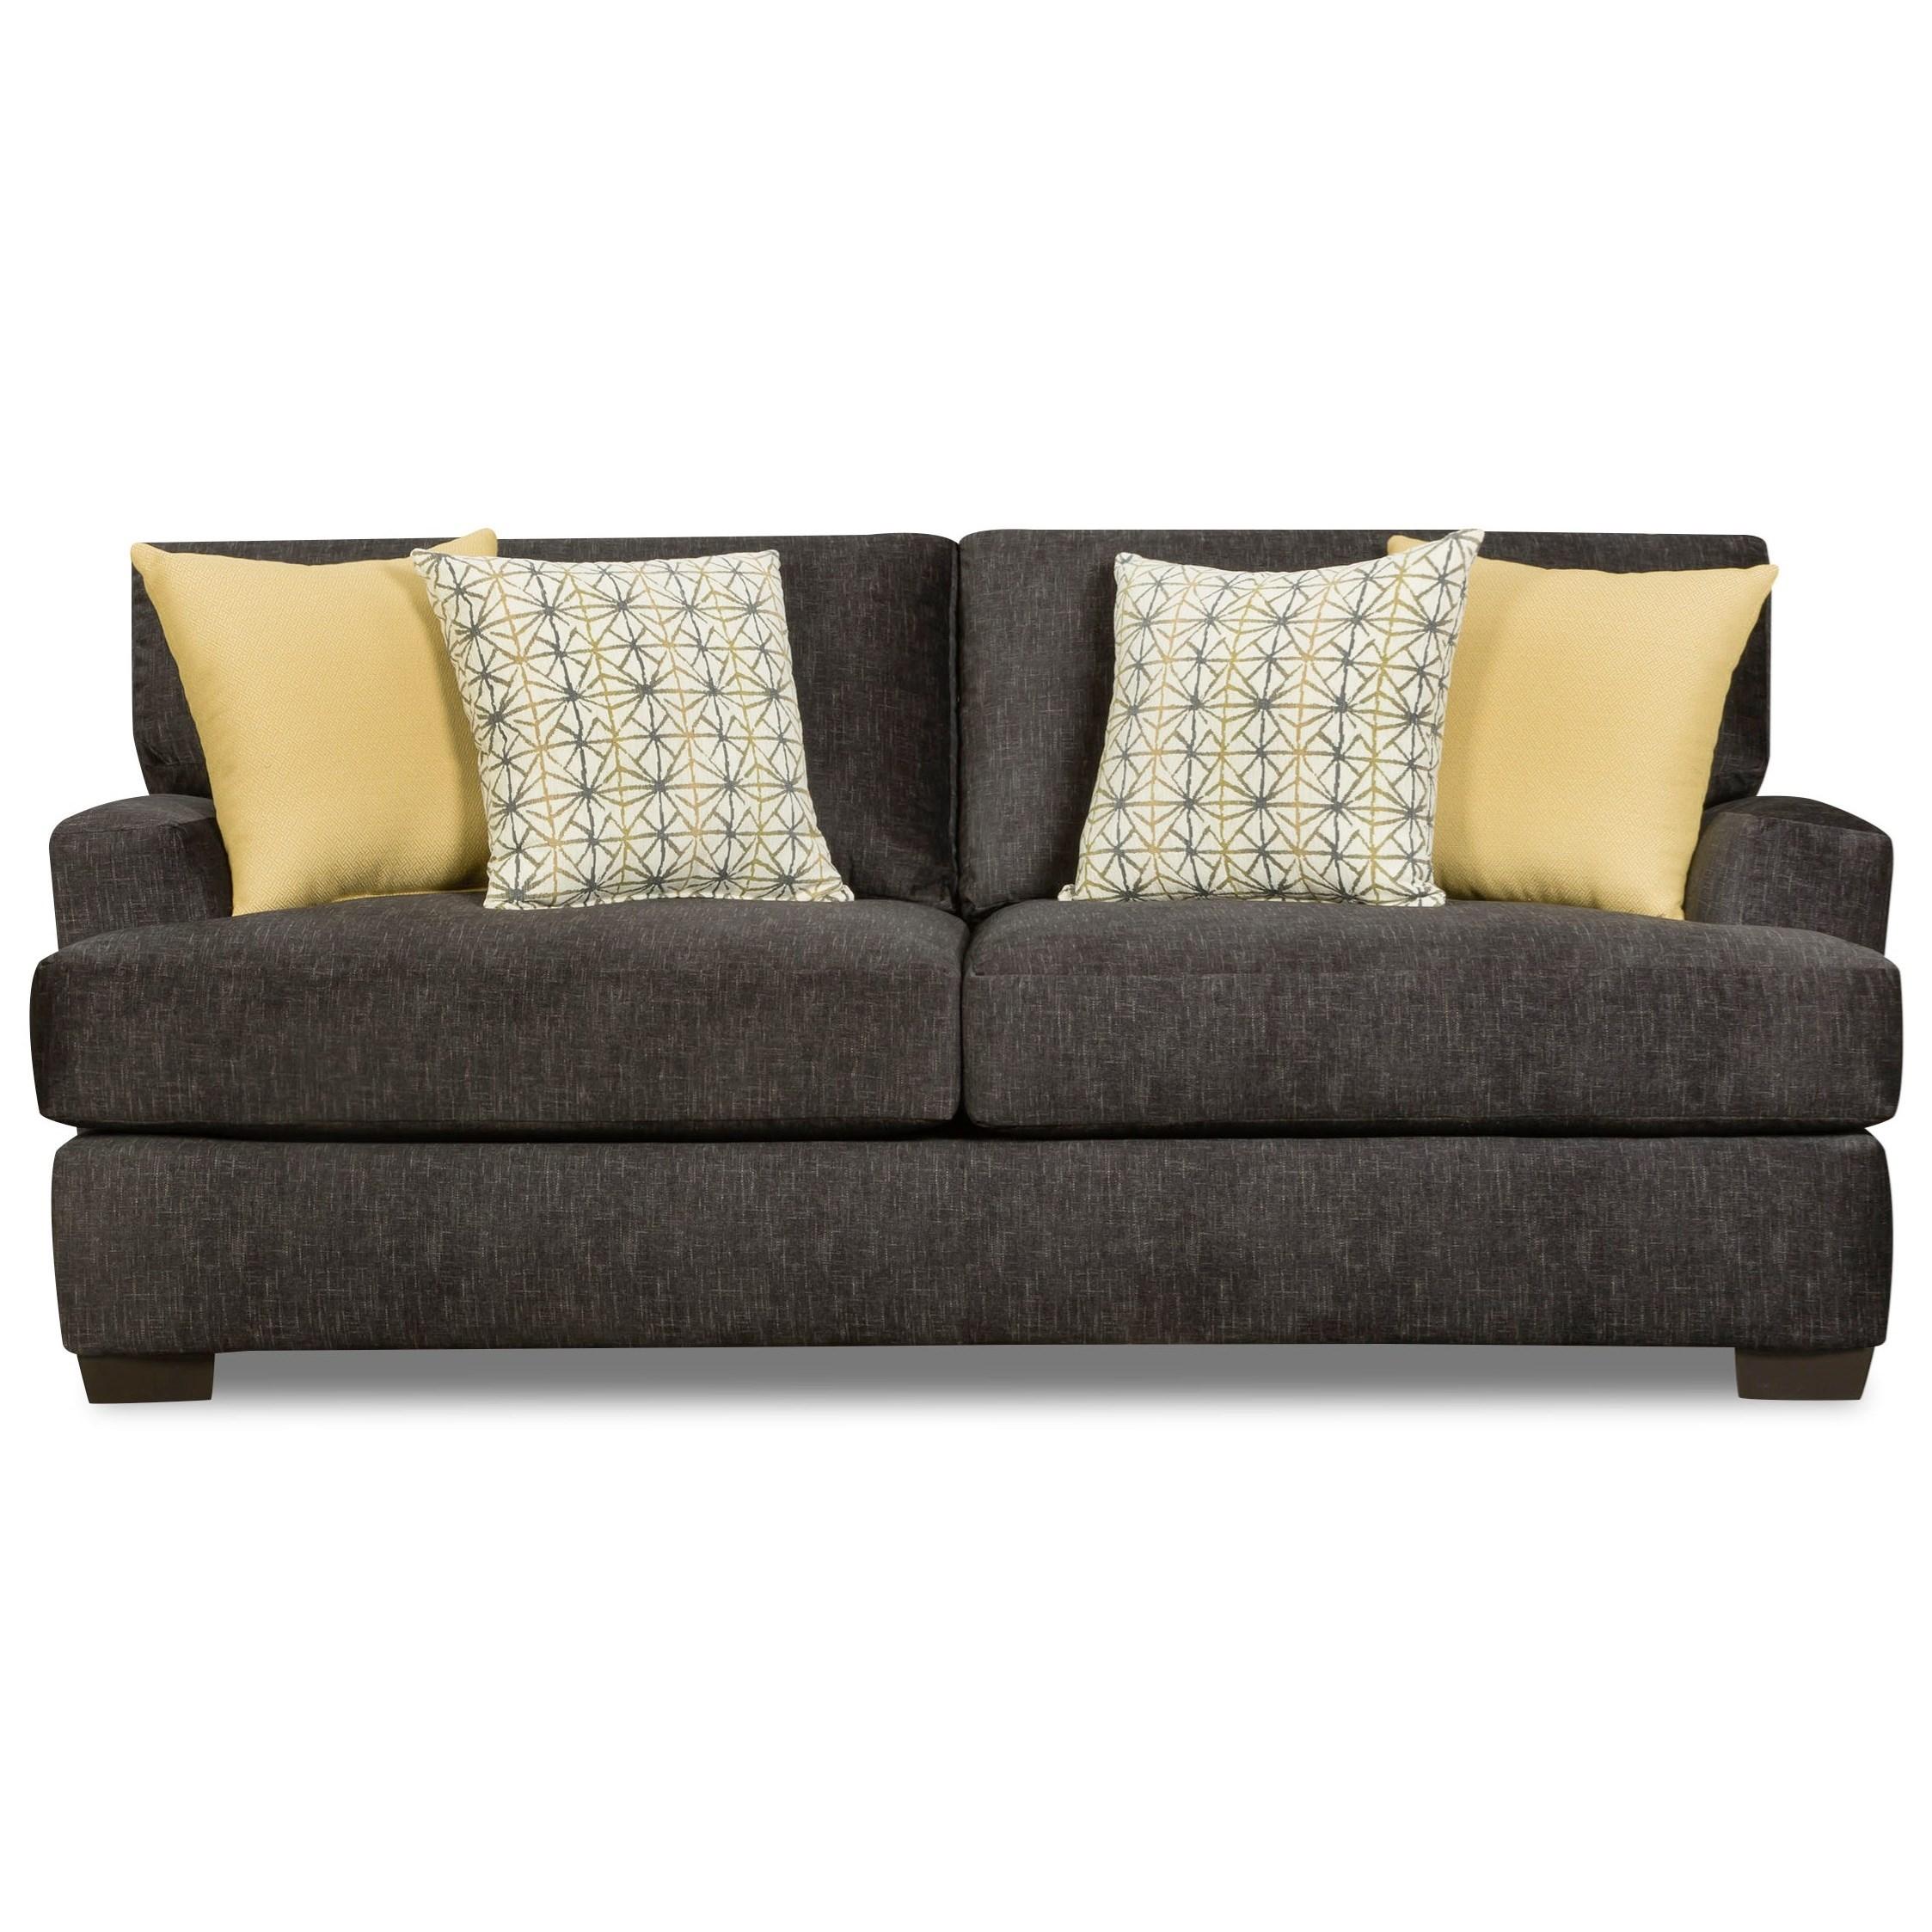 Corinthian 29C0 Sofa With Two Seat Cushions